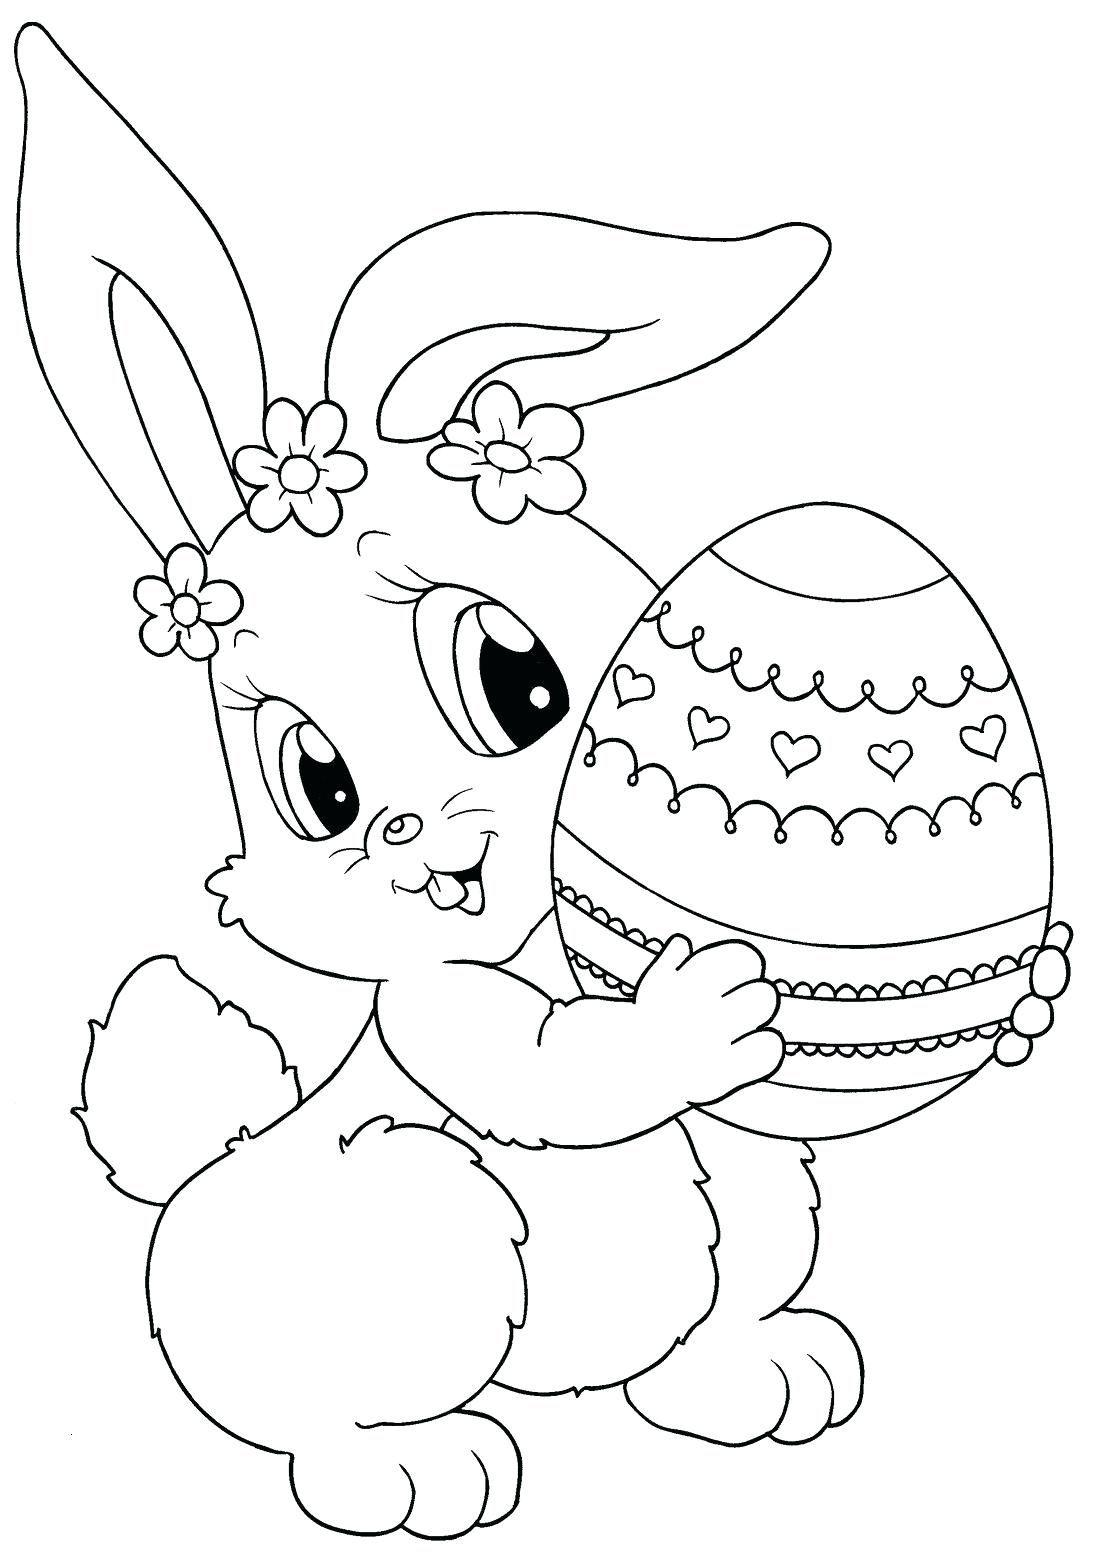 Pin By Karen Summey On Amigurumi Easter Bunny Colouring Easter Coloring Book Bunny Coloring Pages